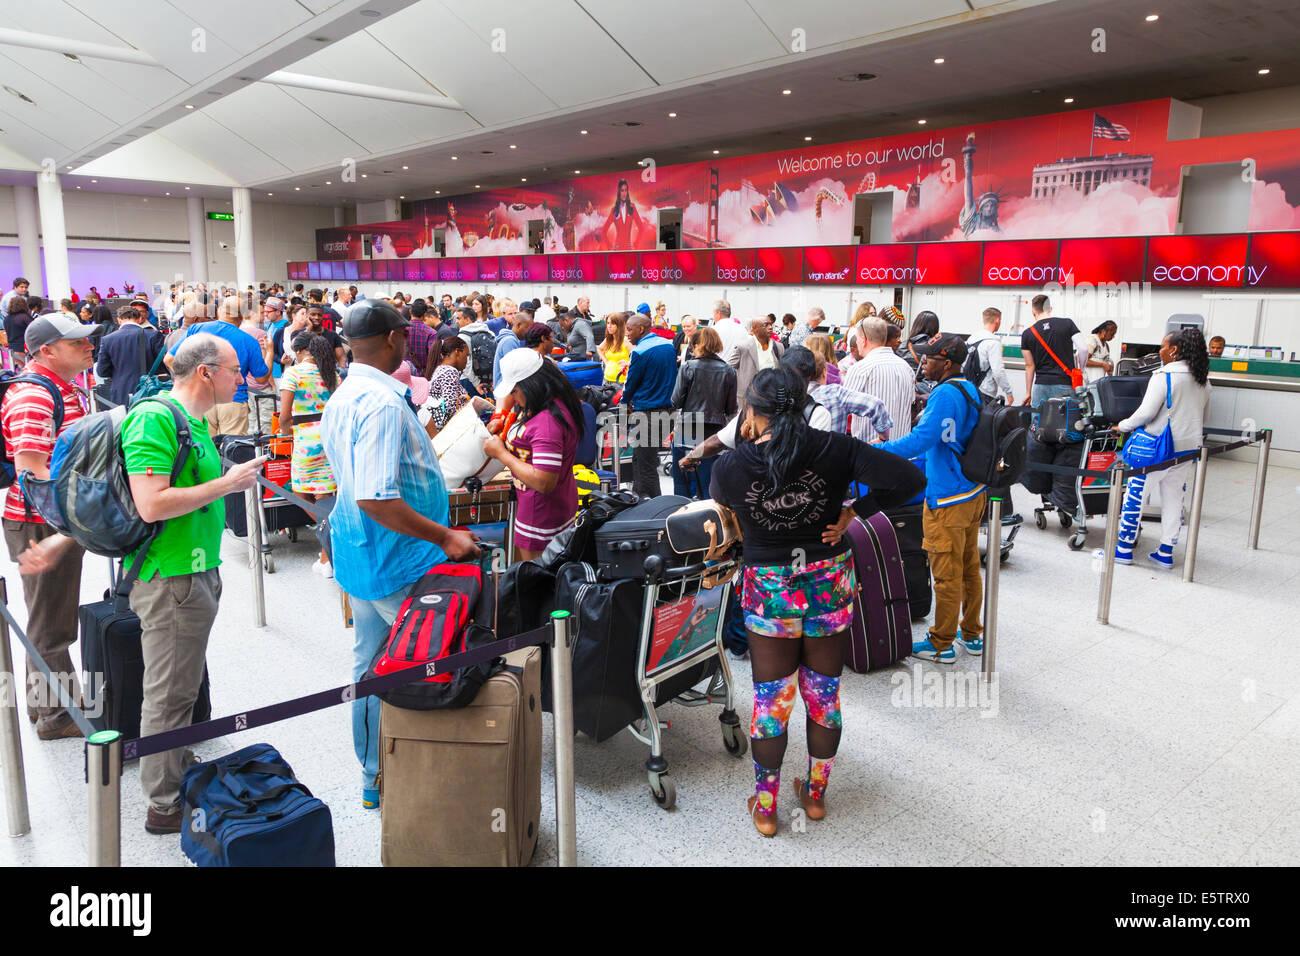 Long queue of passengers waiting to check in at Virgin Atlantic desks. - Stock Image